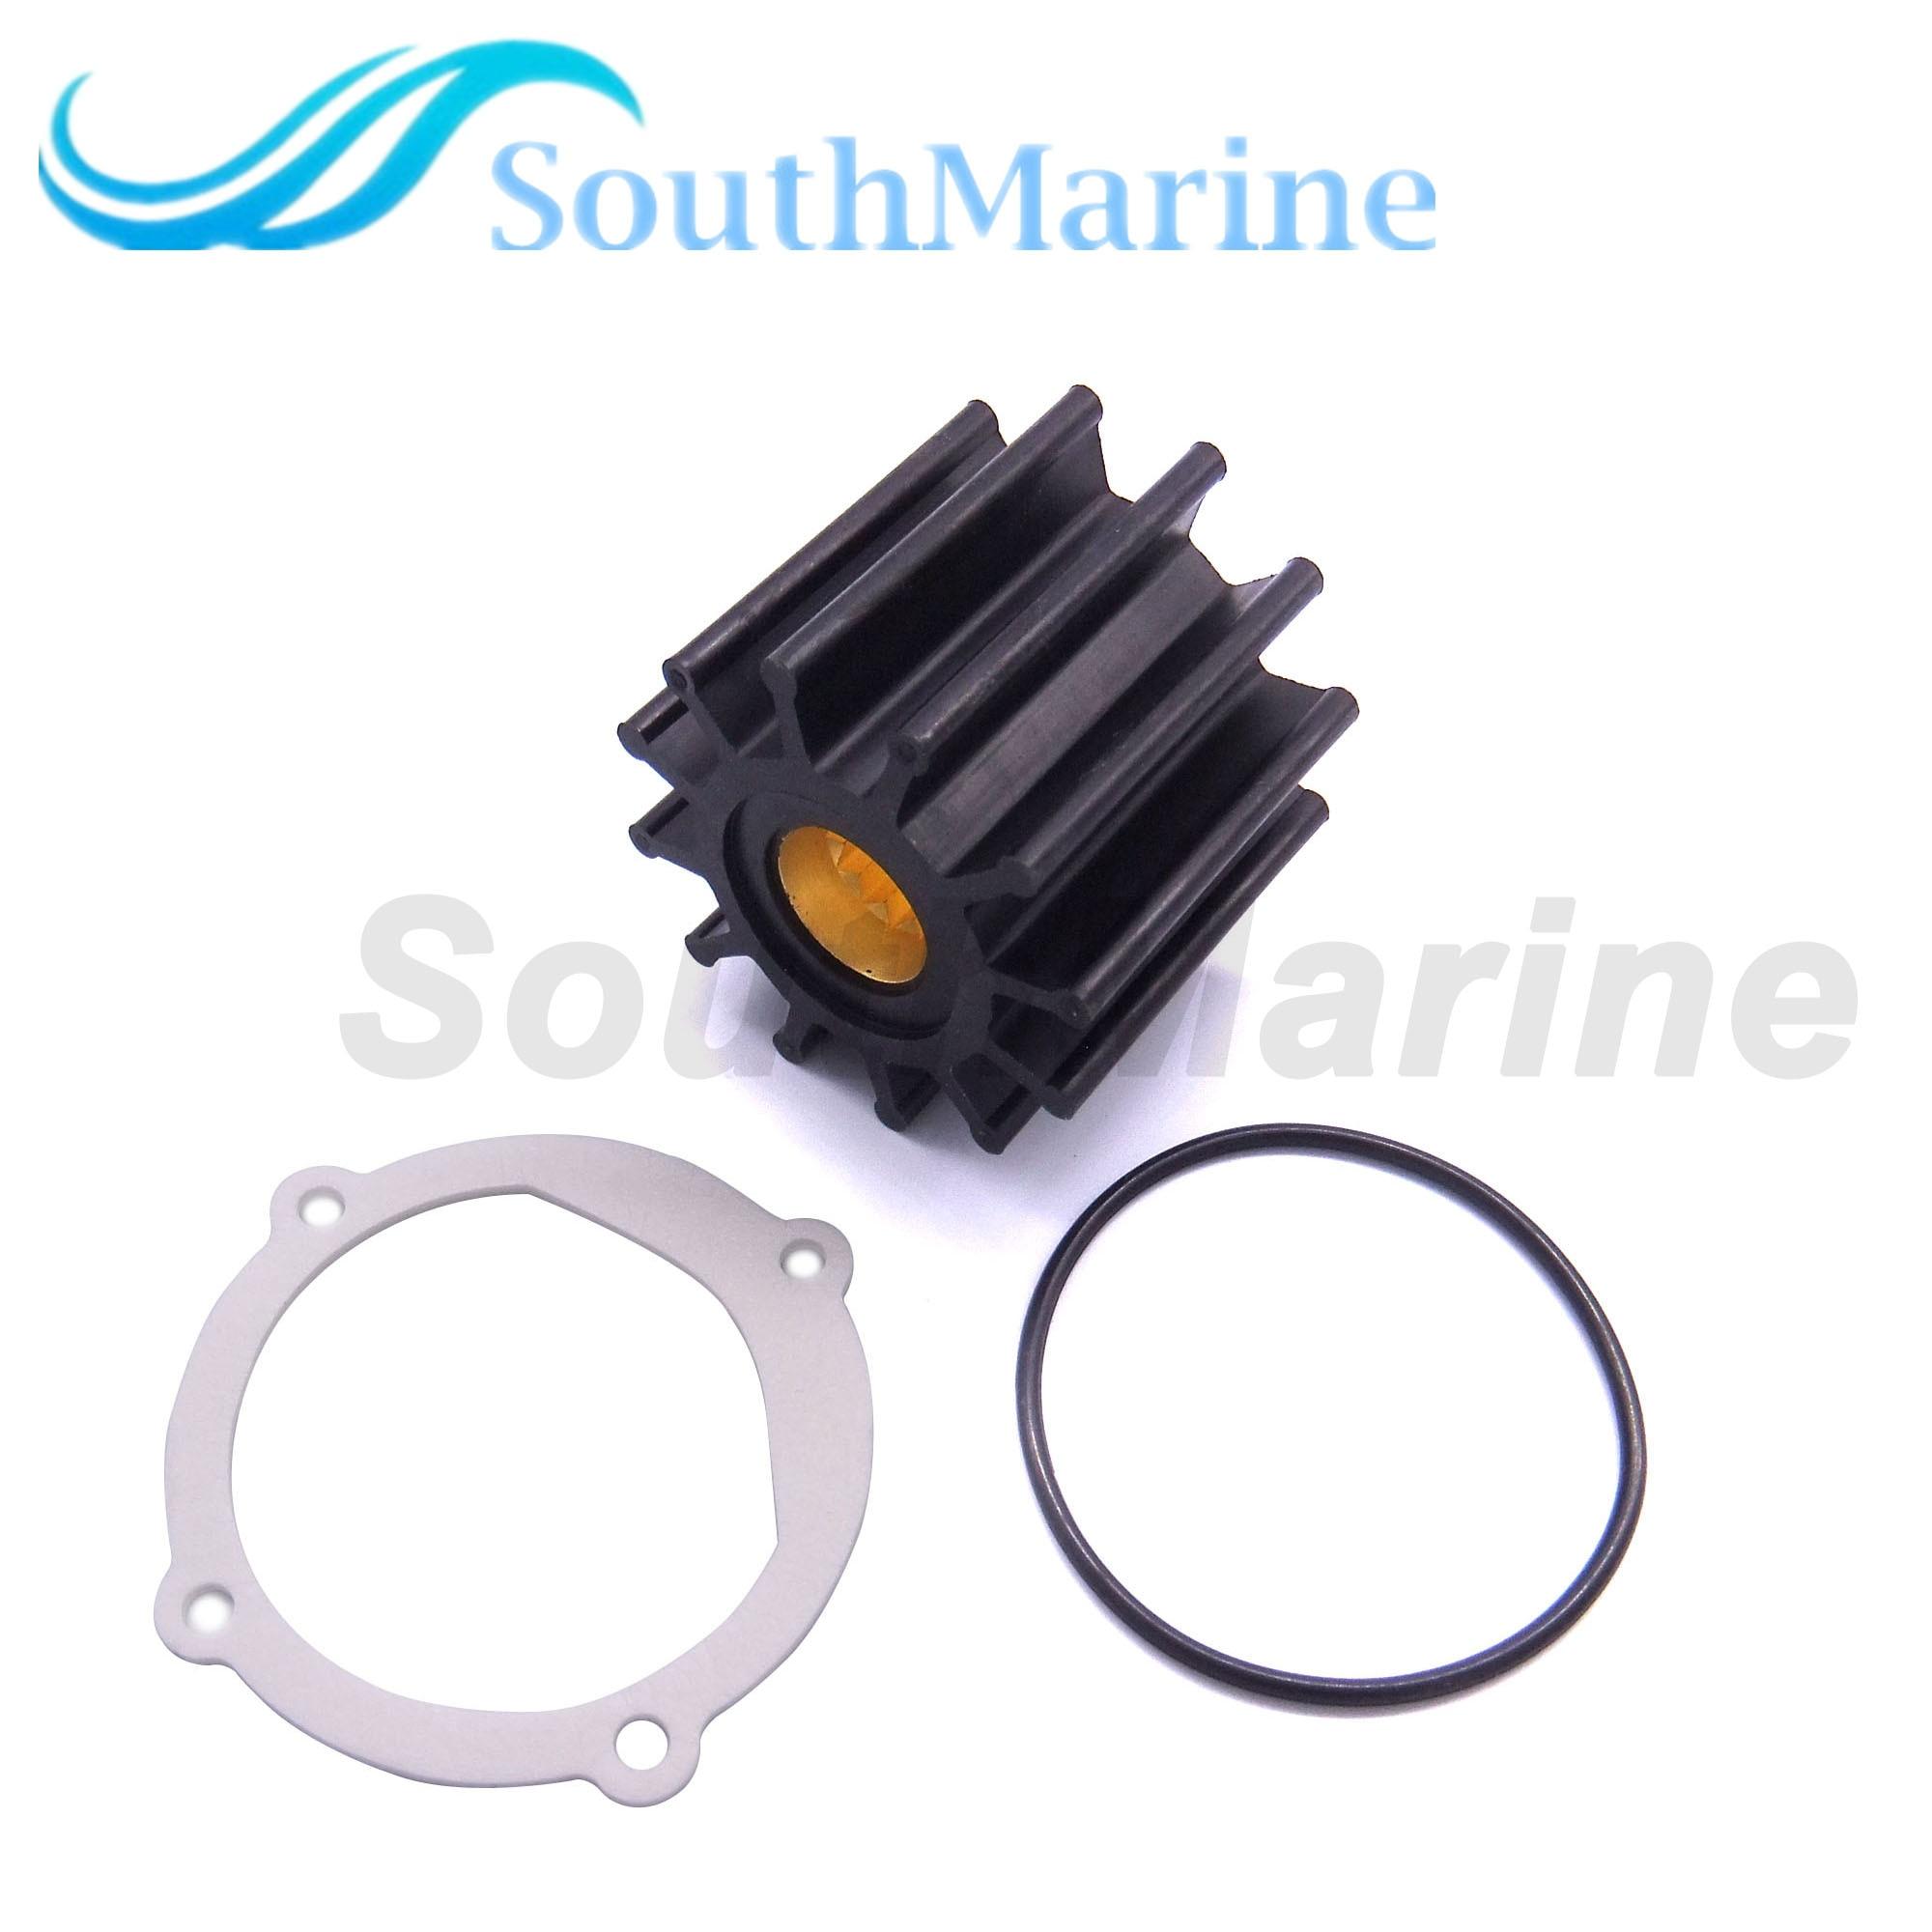 Impeller 09-812B 13554-0001 119773-42600 S685007 18-3306 6TA-12457-00 For Yanmar / Johnson / Yamaha / Volvo Penta Pumps